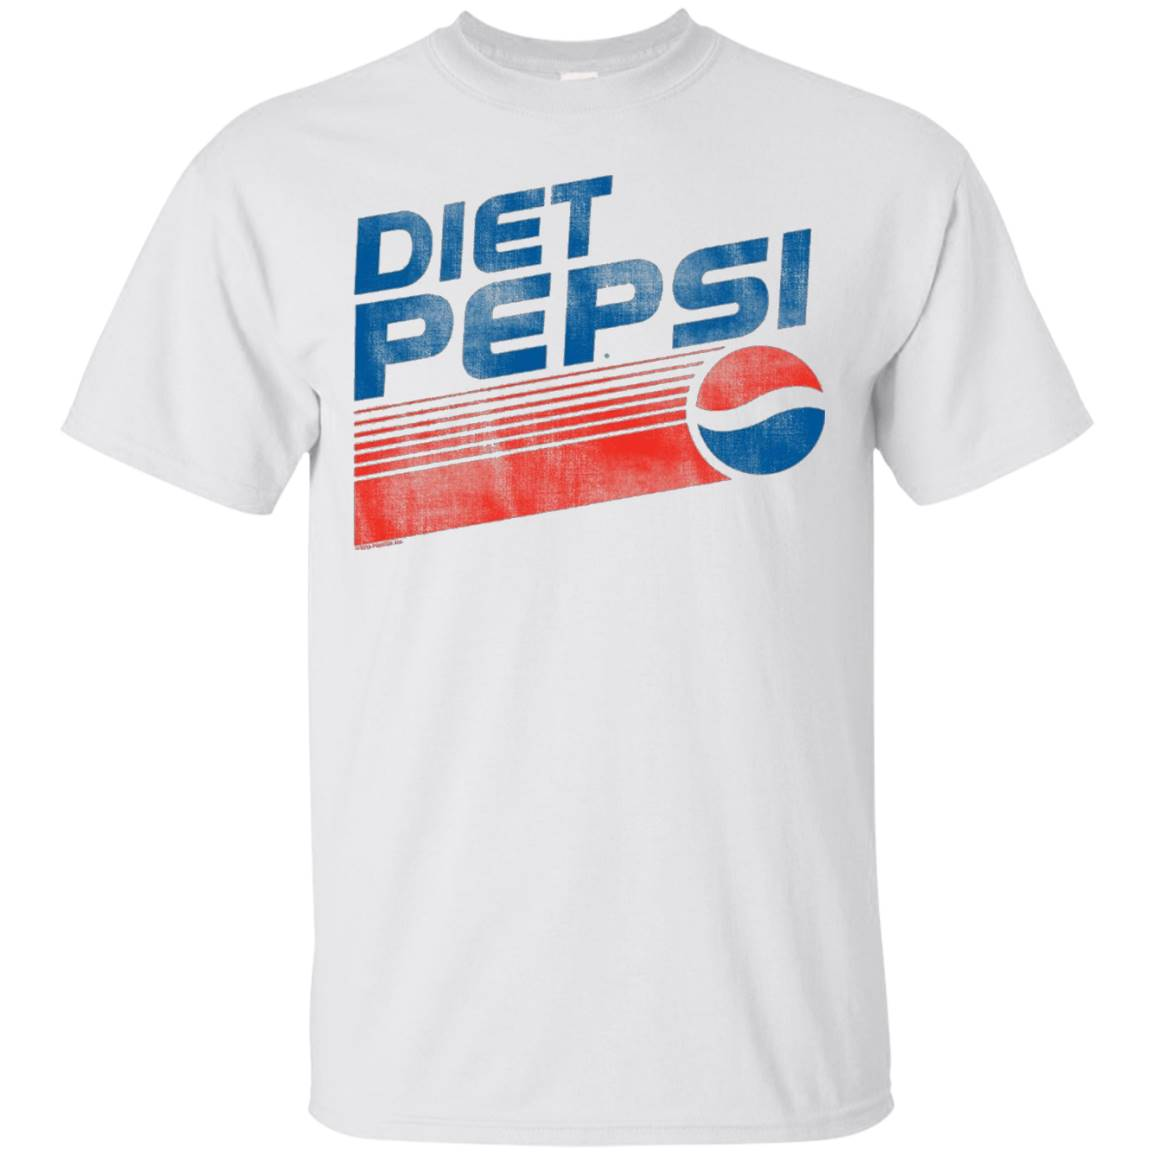 Diet Pepsi T-Shirt